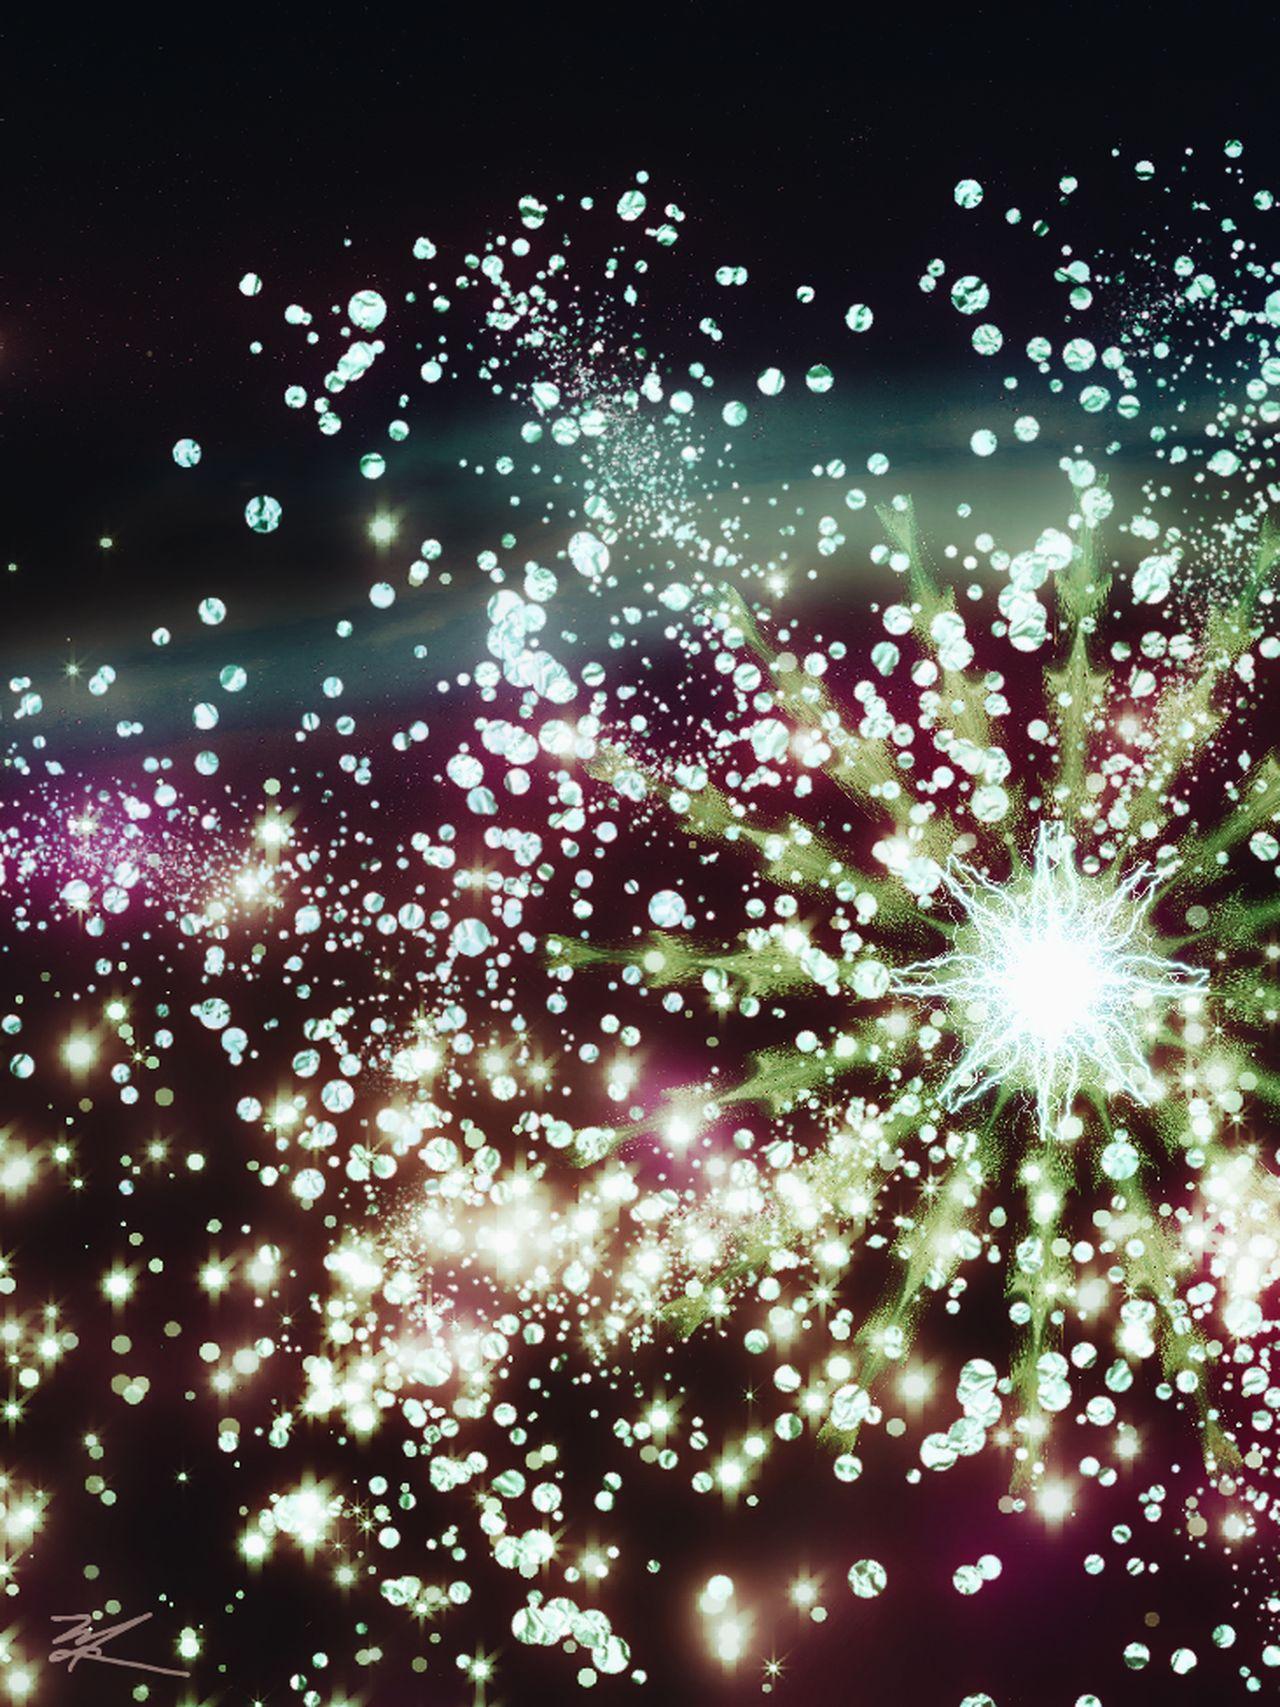 Exploding No People Illuminated Motion Abstract My Artwork Digital Art Abstract Art